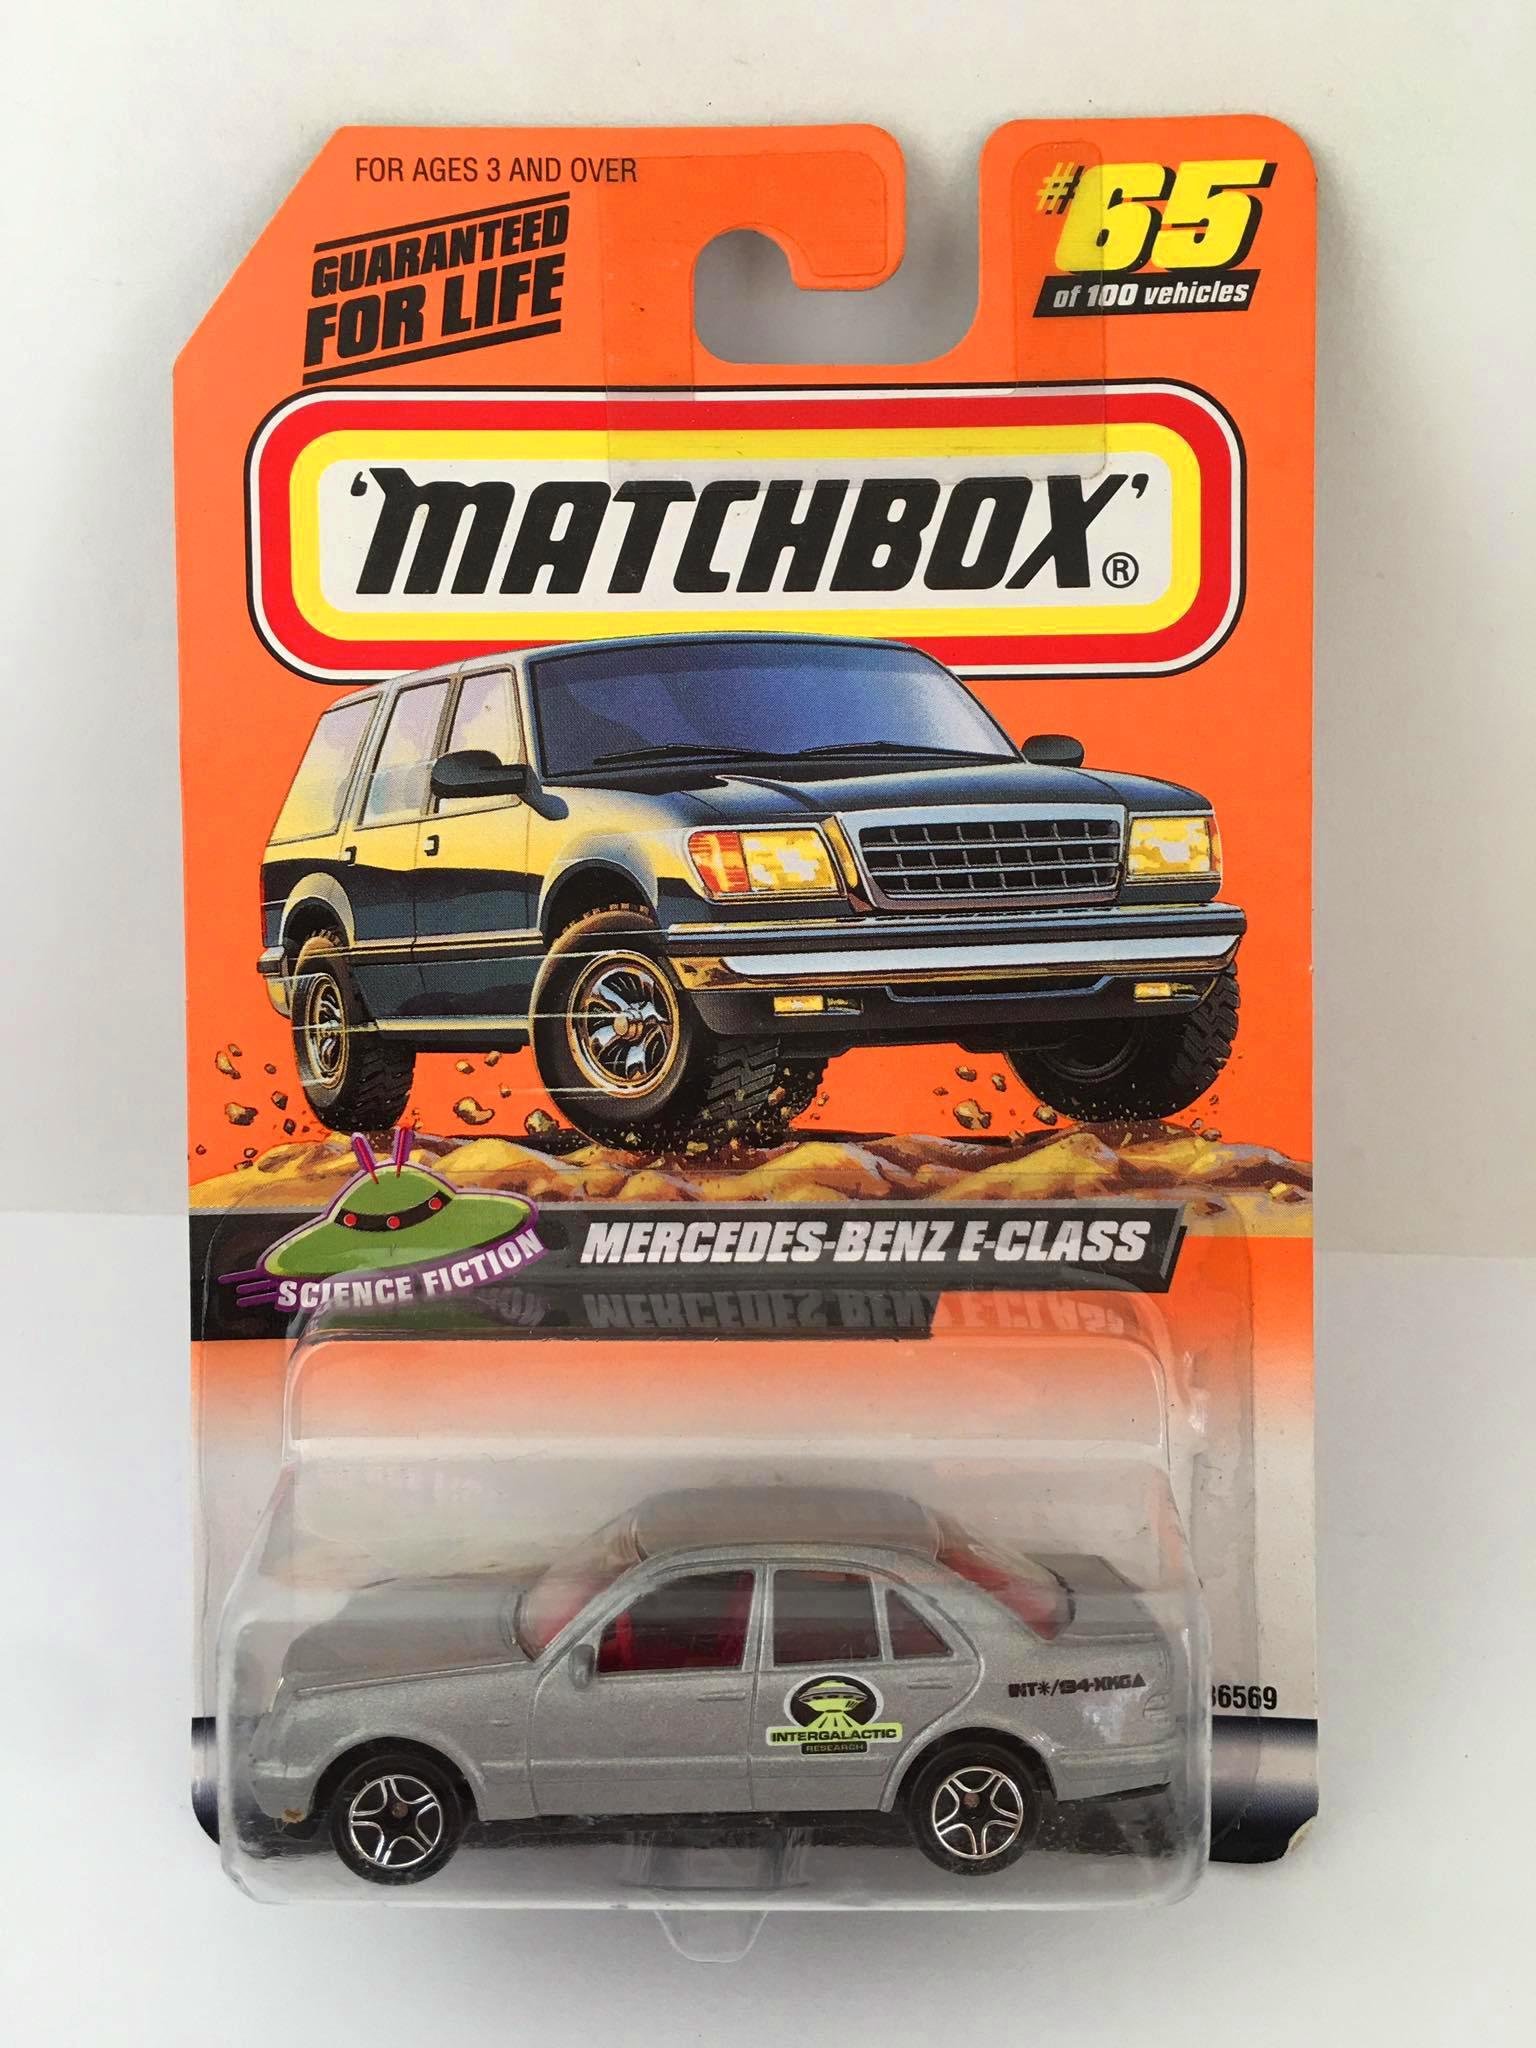 Matchbox - Mercedes-Benz E-Class Cinza - Básico 1999